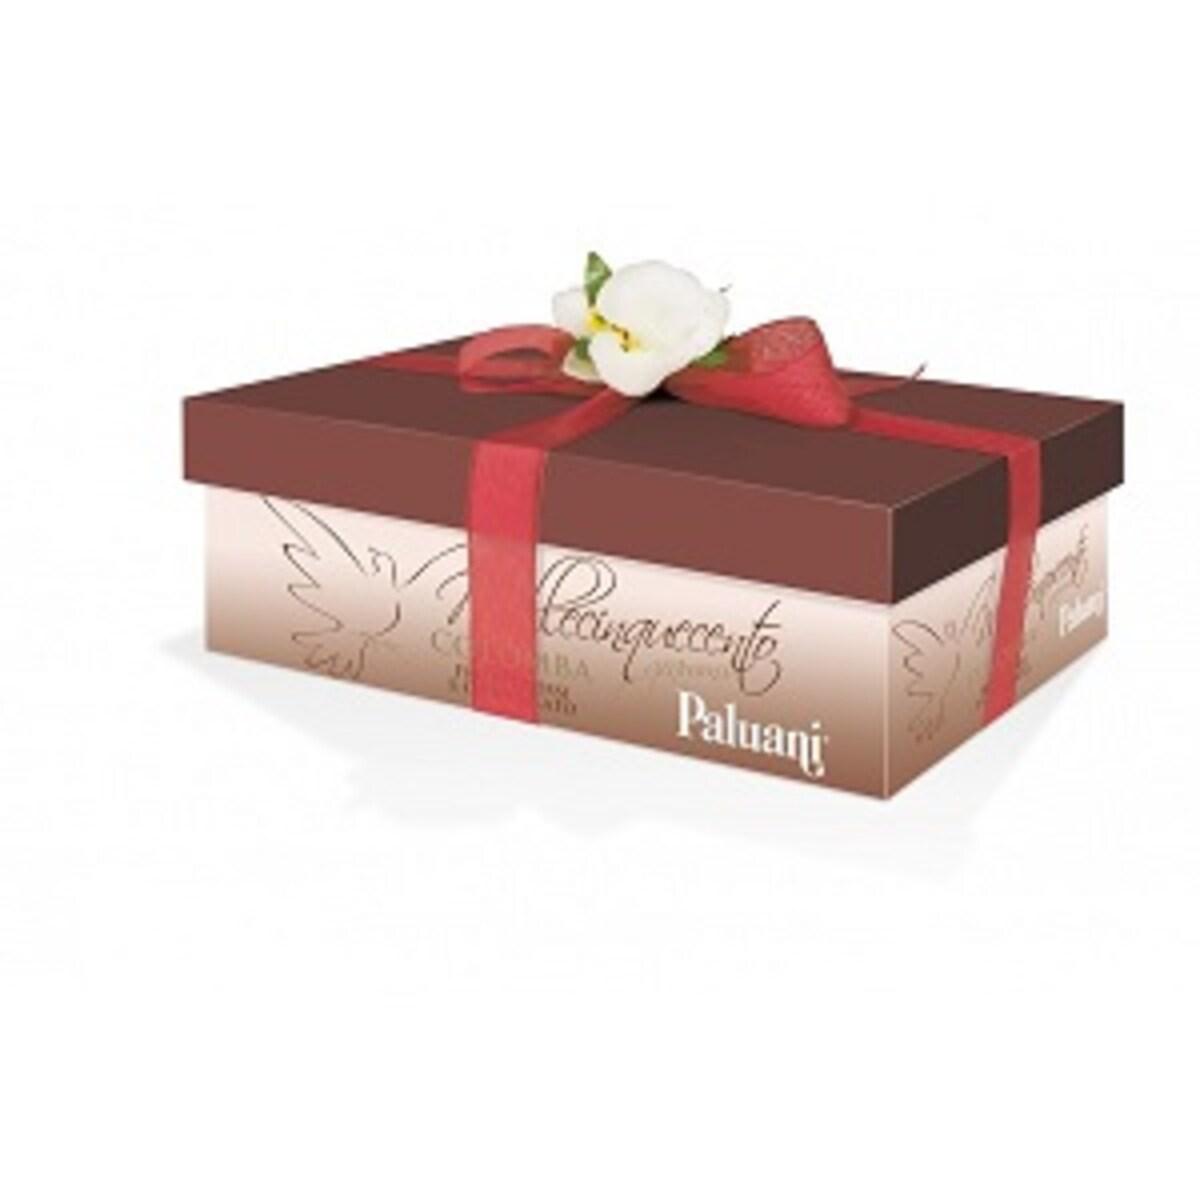 Панетоне Paluani Colomba Frutti Rossi e Cioccolata италиански козунак 1.5кг